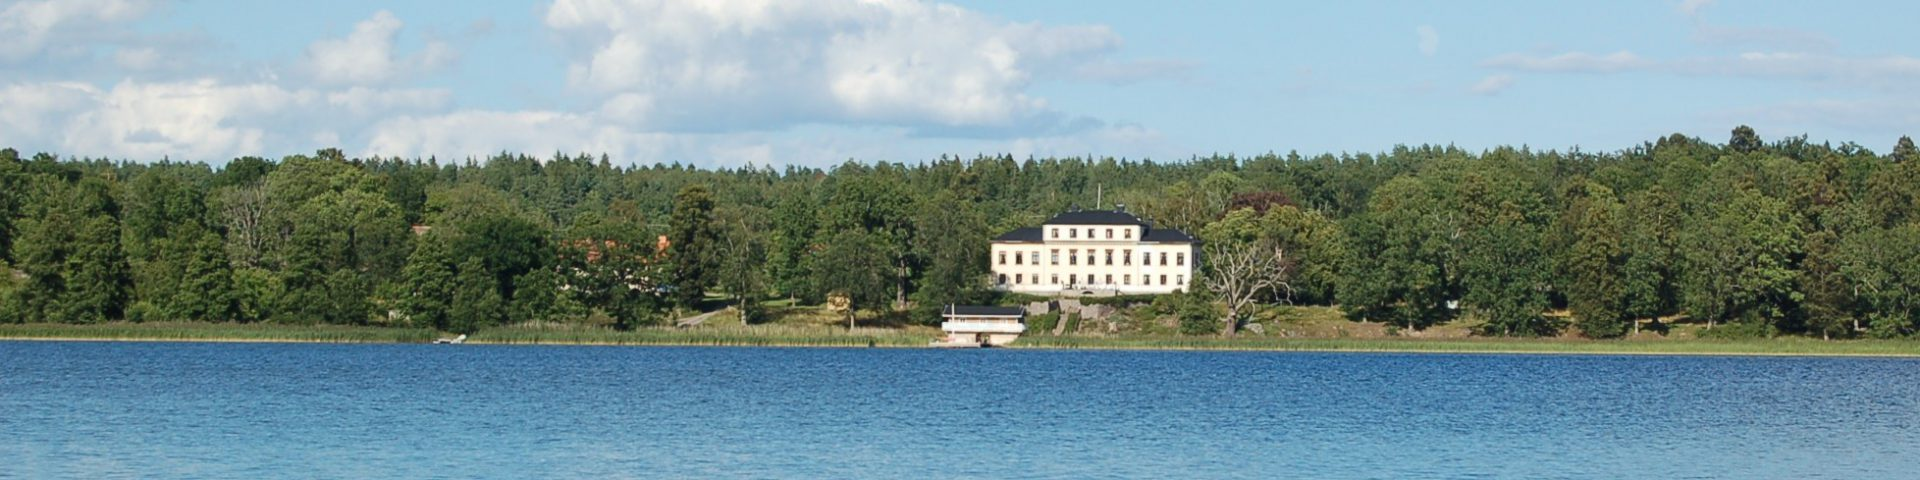 Casimirsborgs gård